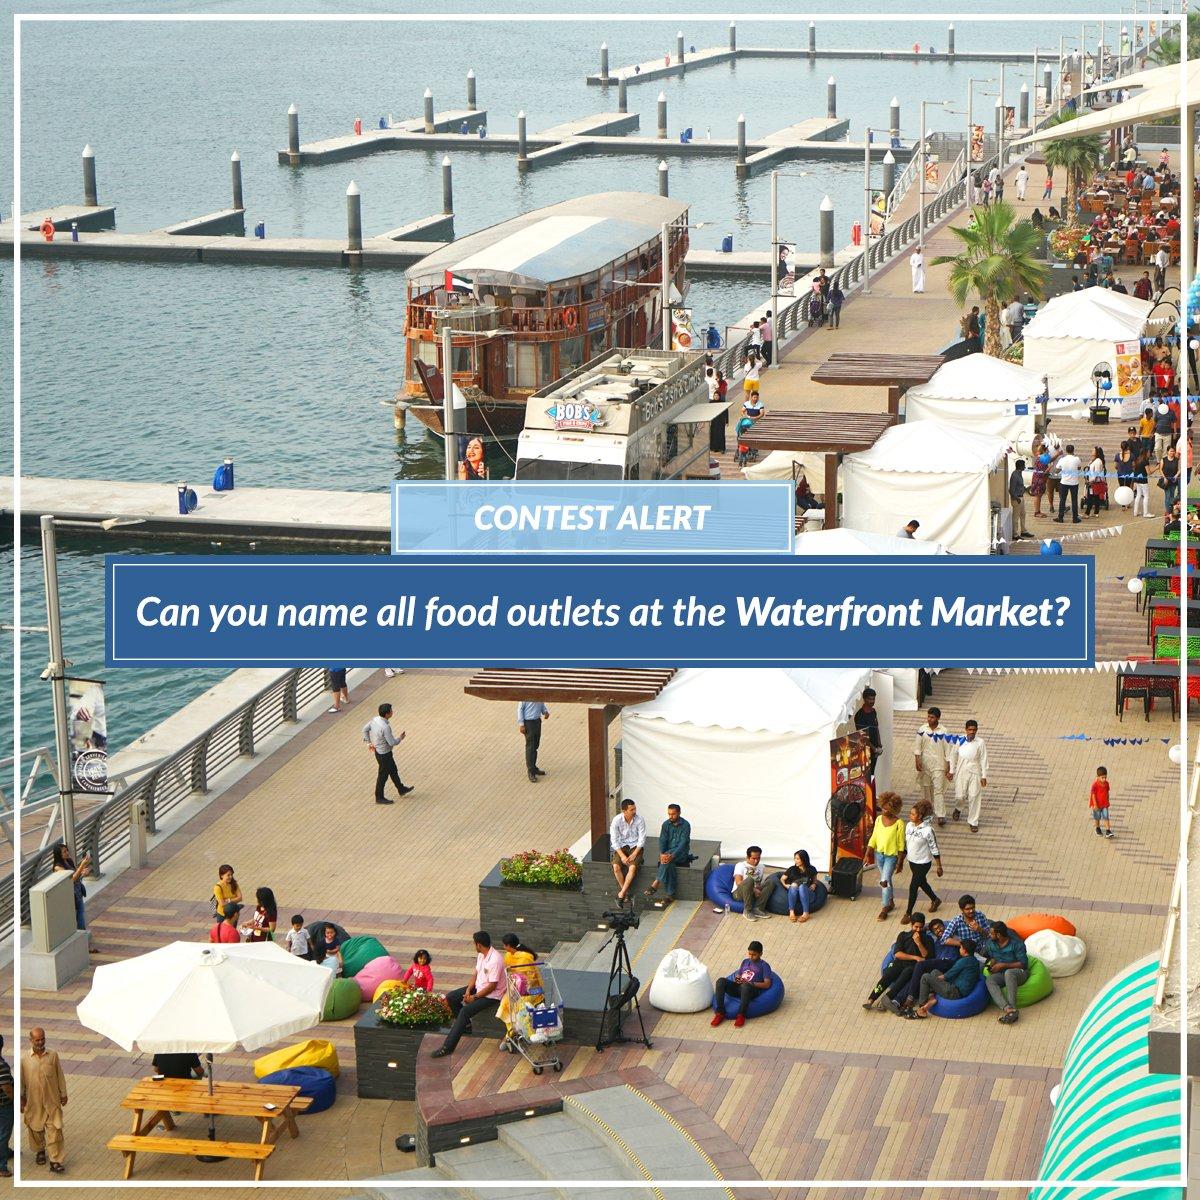 Waterfront Market on Twitter: